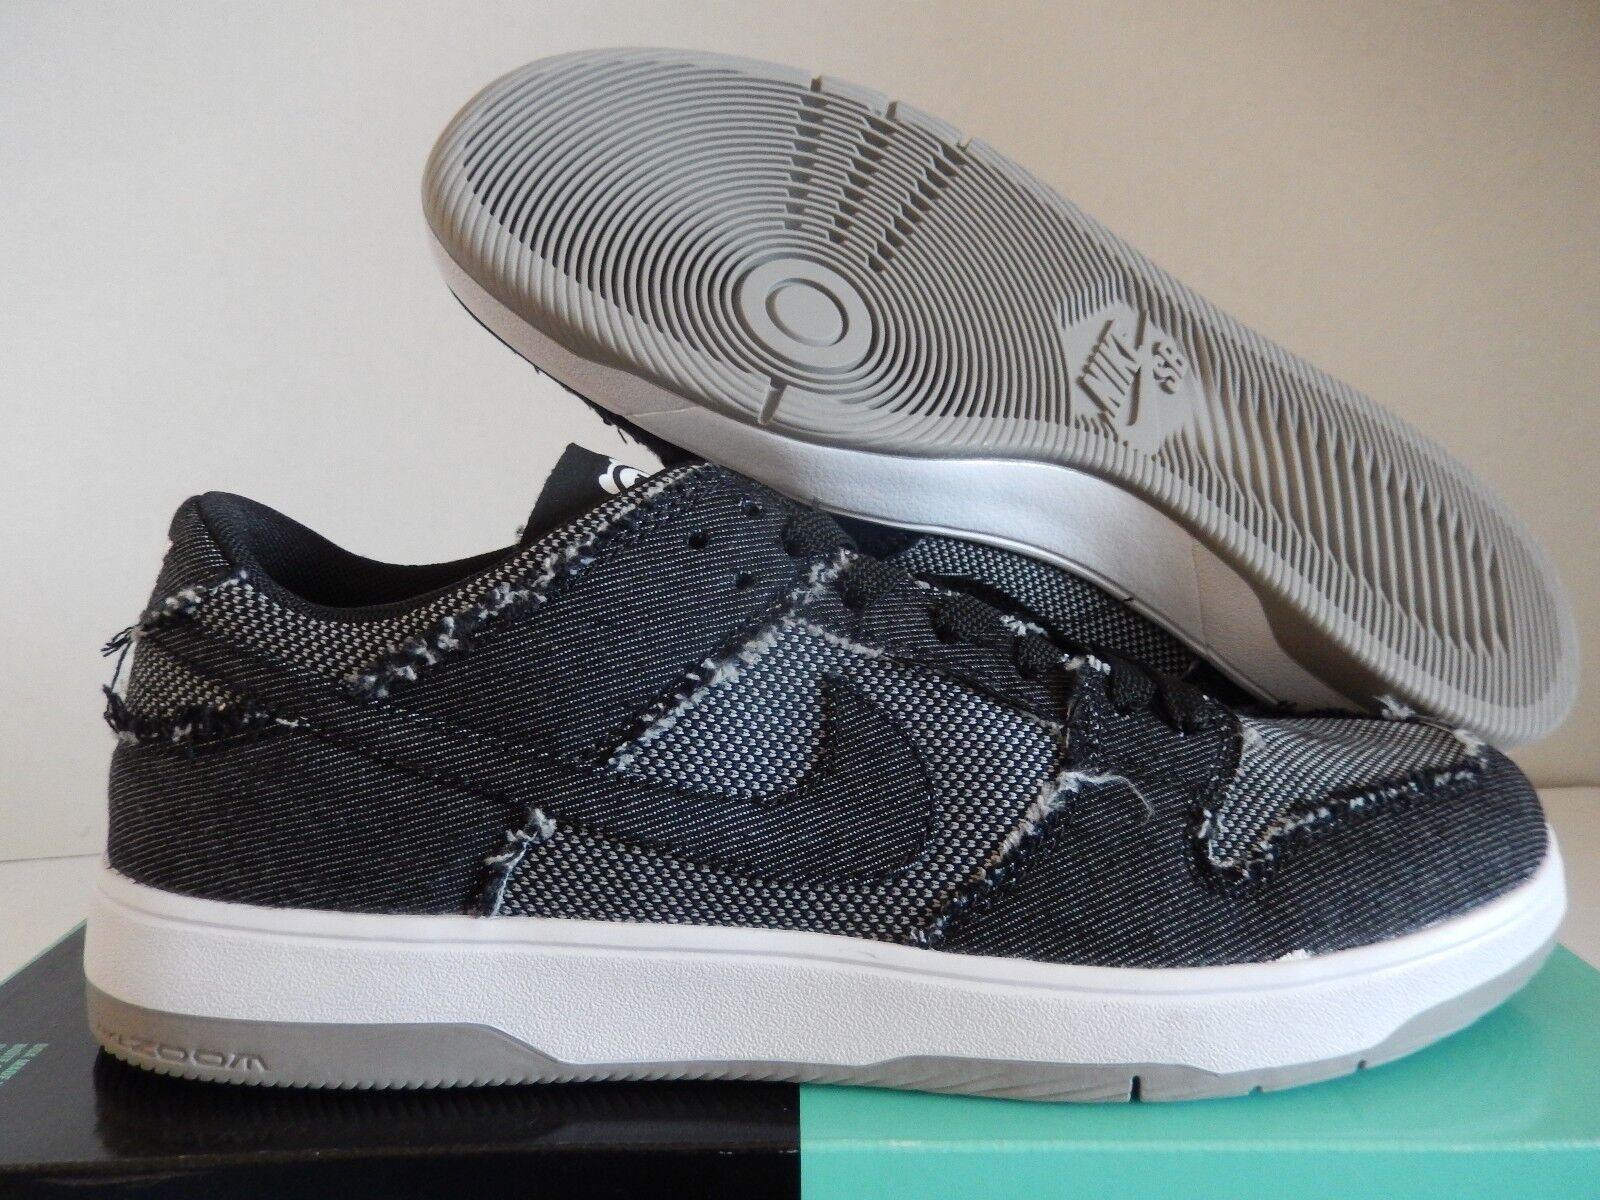 Nike SB Zoom Negro Dunk Low Qs Bearbrick Medicom Elite Negro Zoom Denim [877063002] a05a40